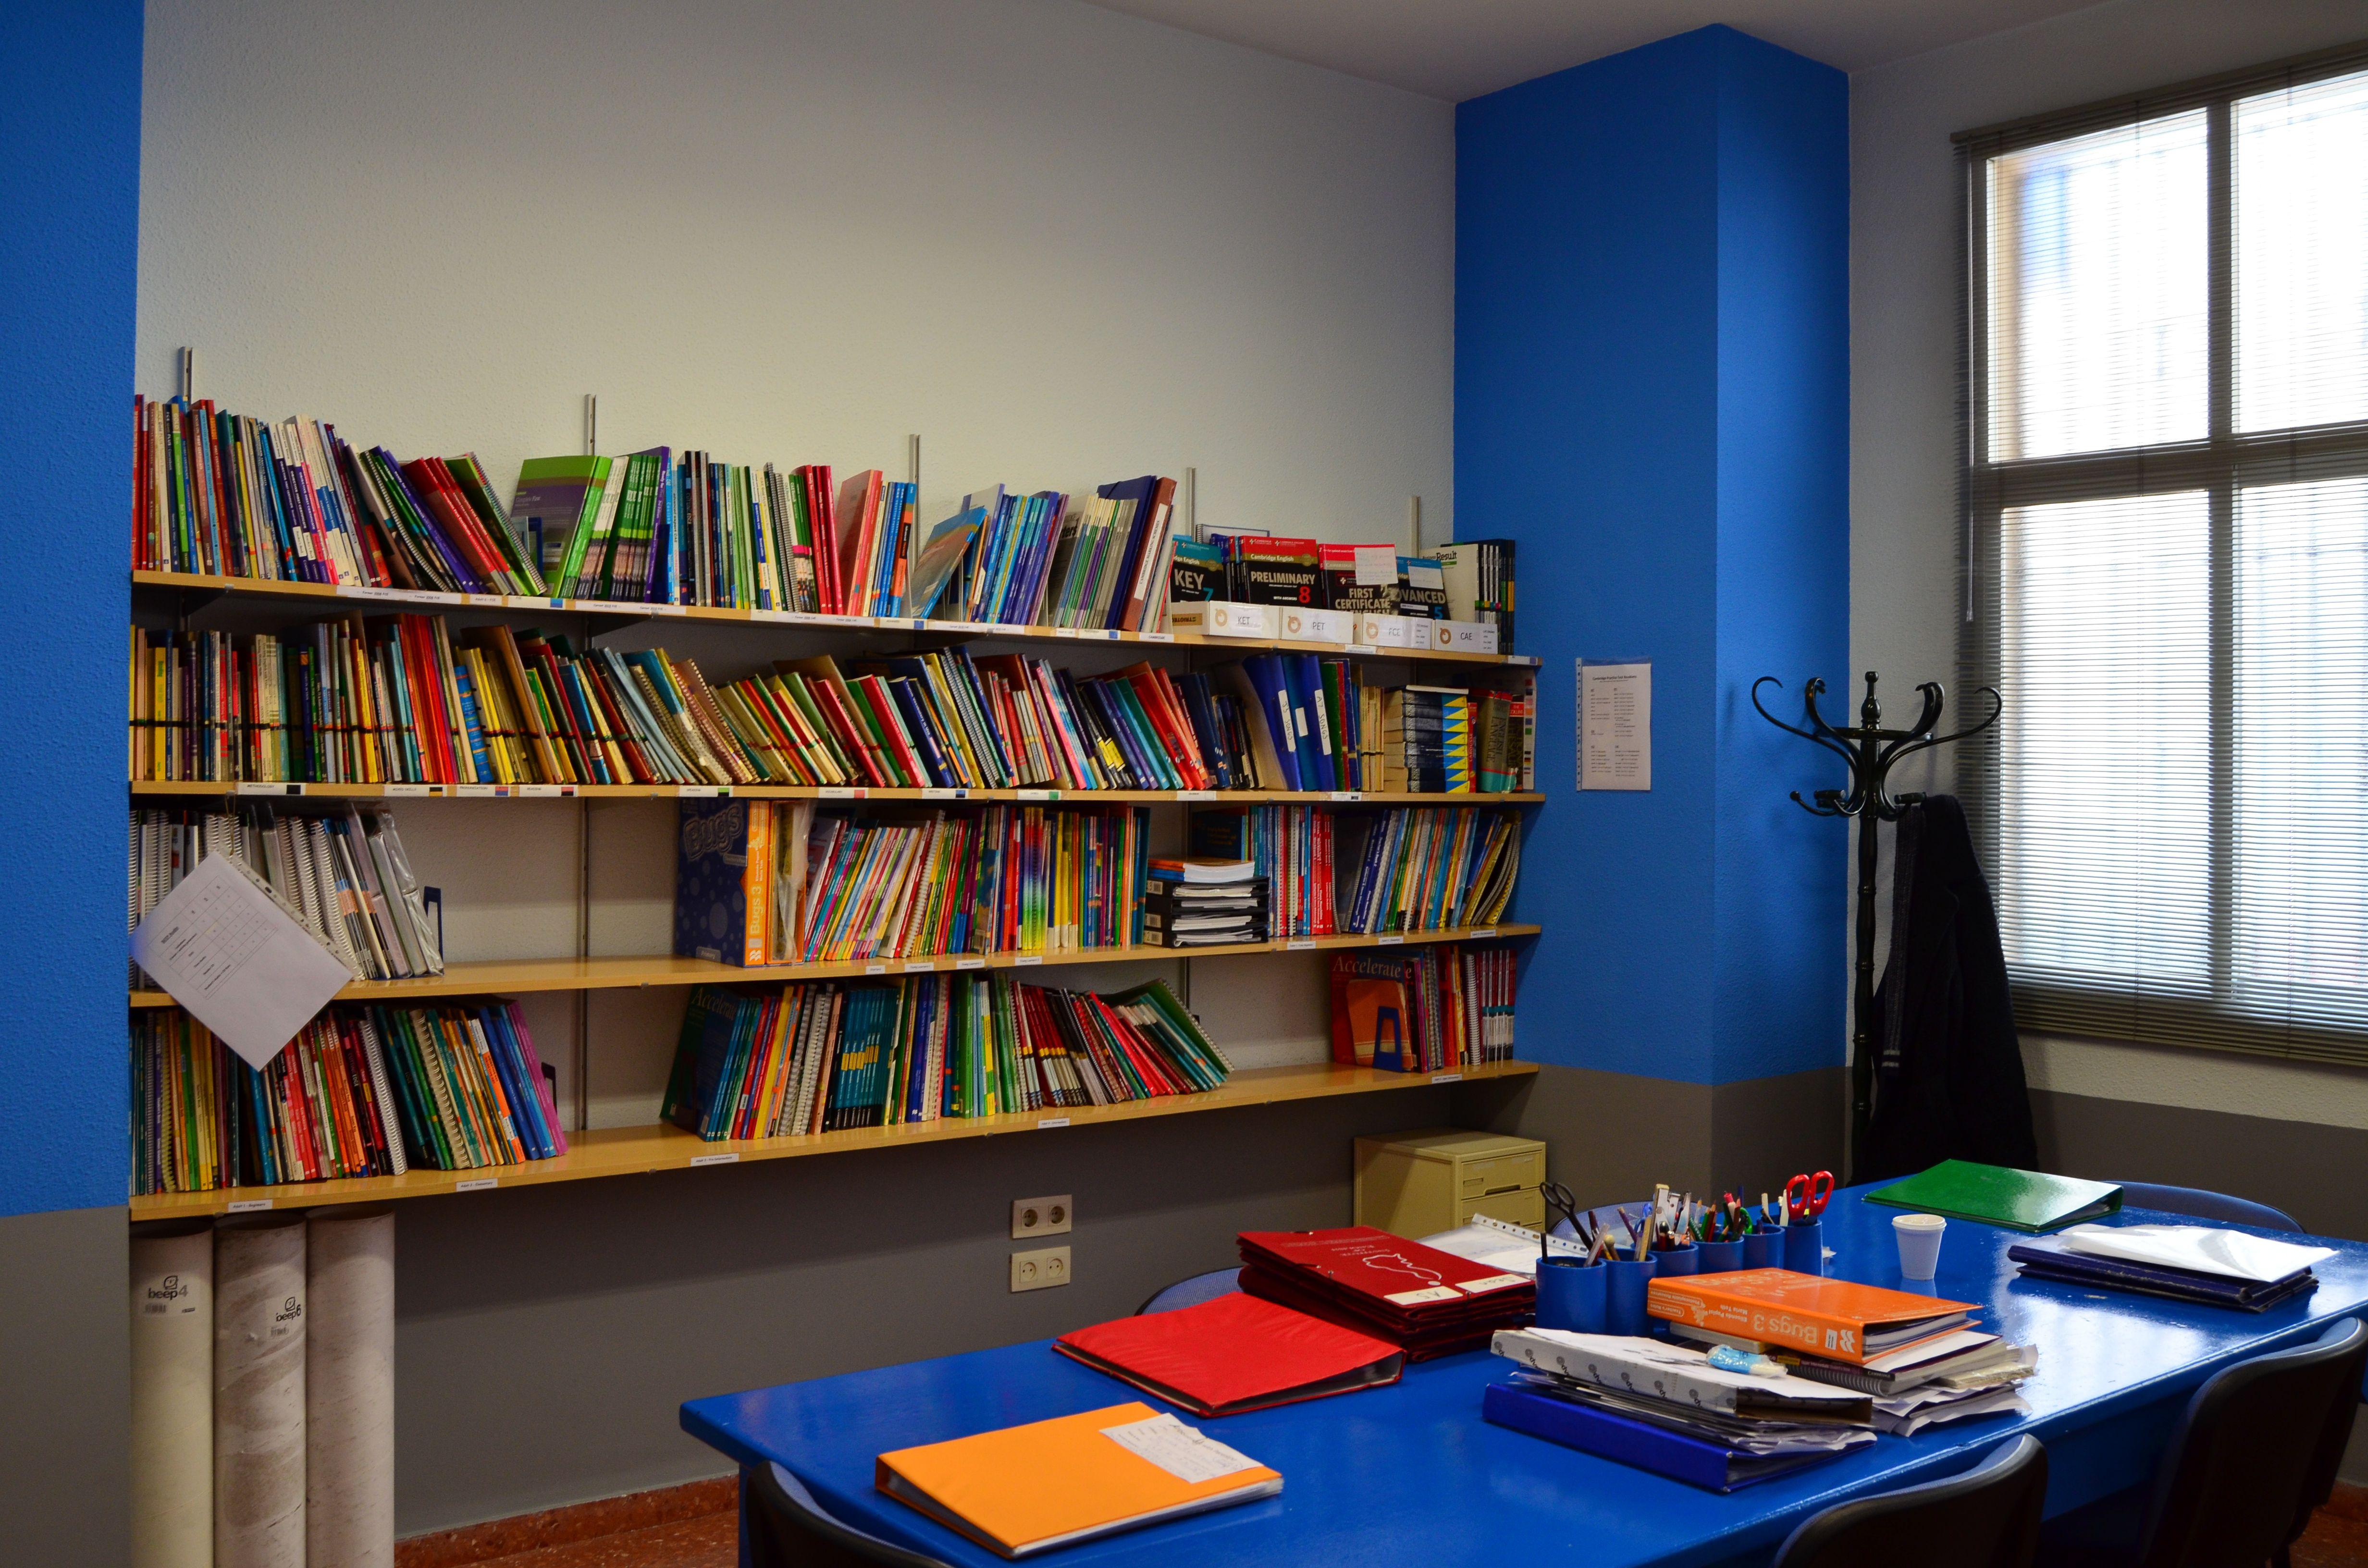 Foto 2 de Academias de idiomas en Burjassot | Institute of English